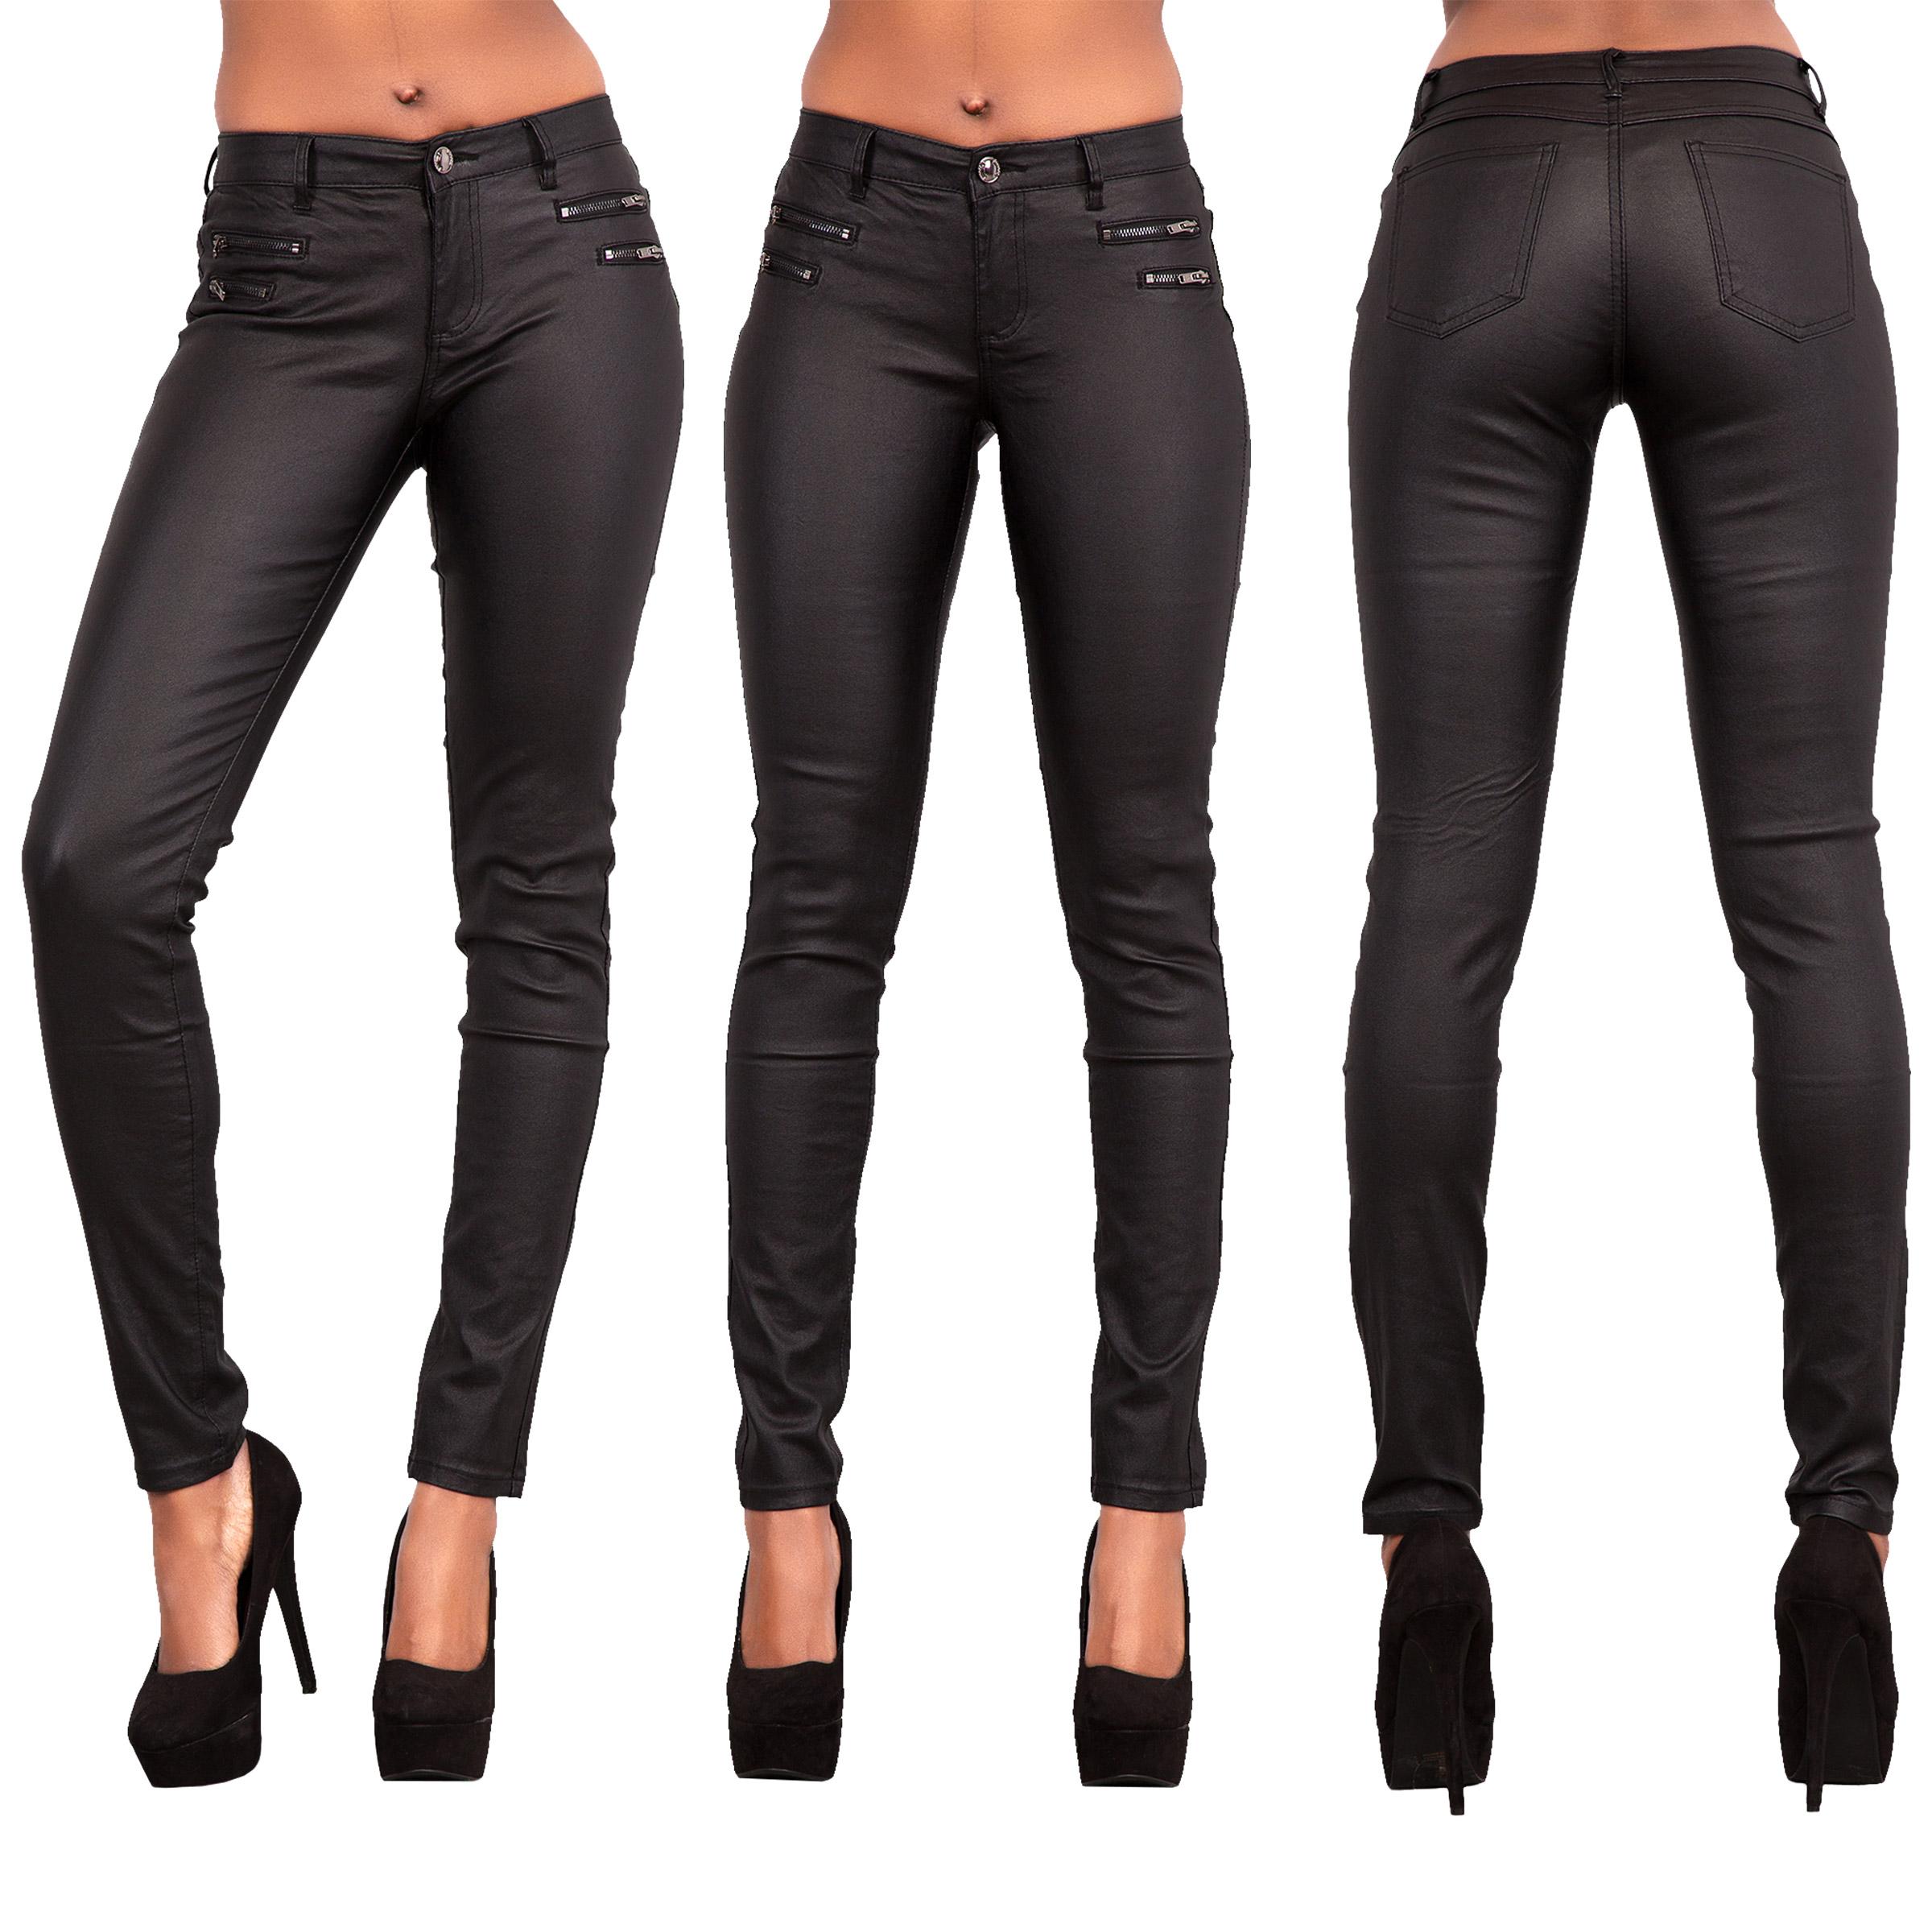 Belt Sizes 6 8 10 12 14 16 Ladies straight leg Office work style Trousers Black